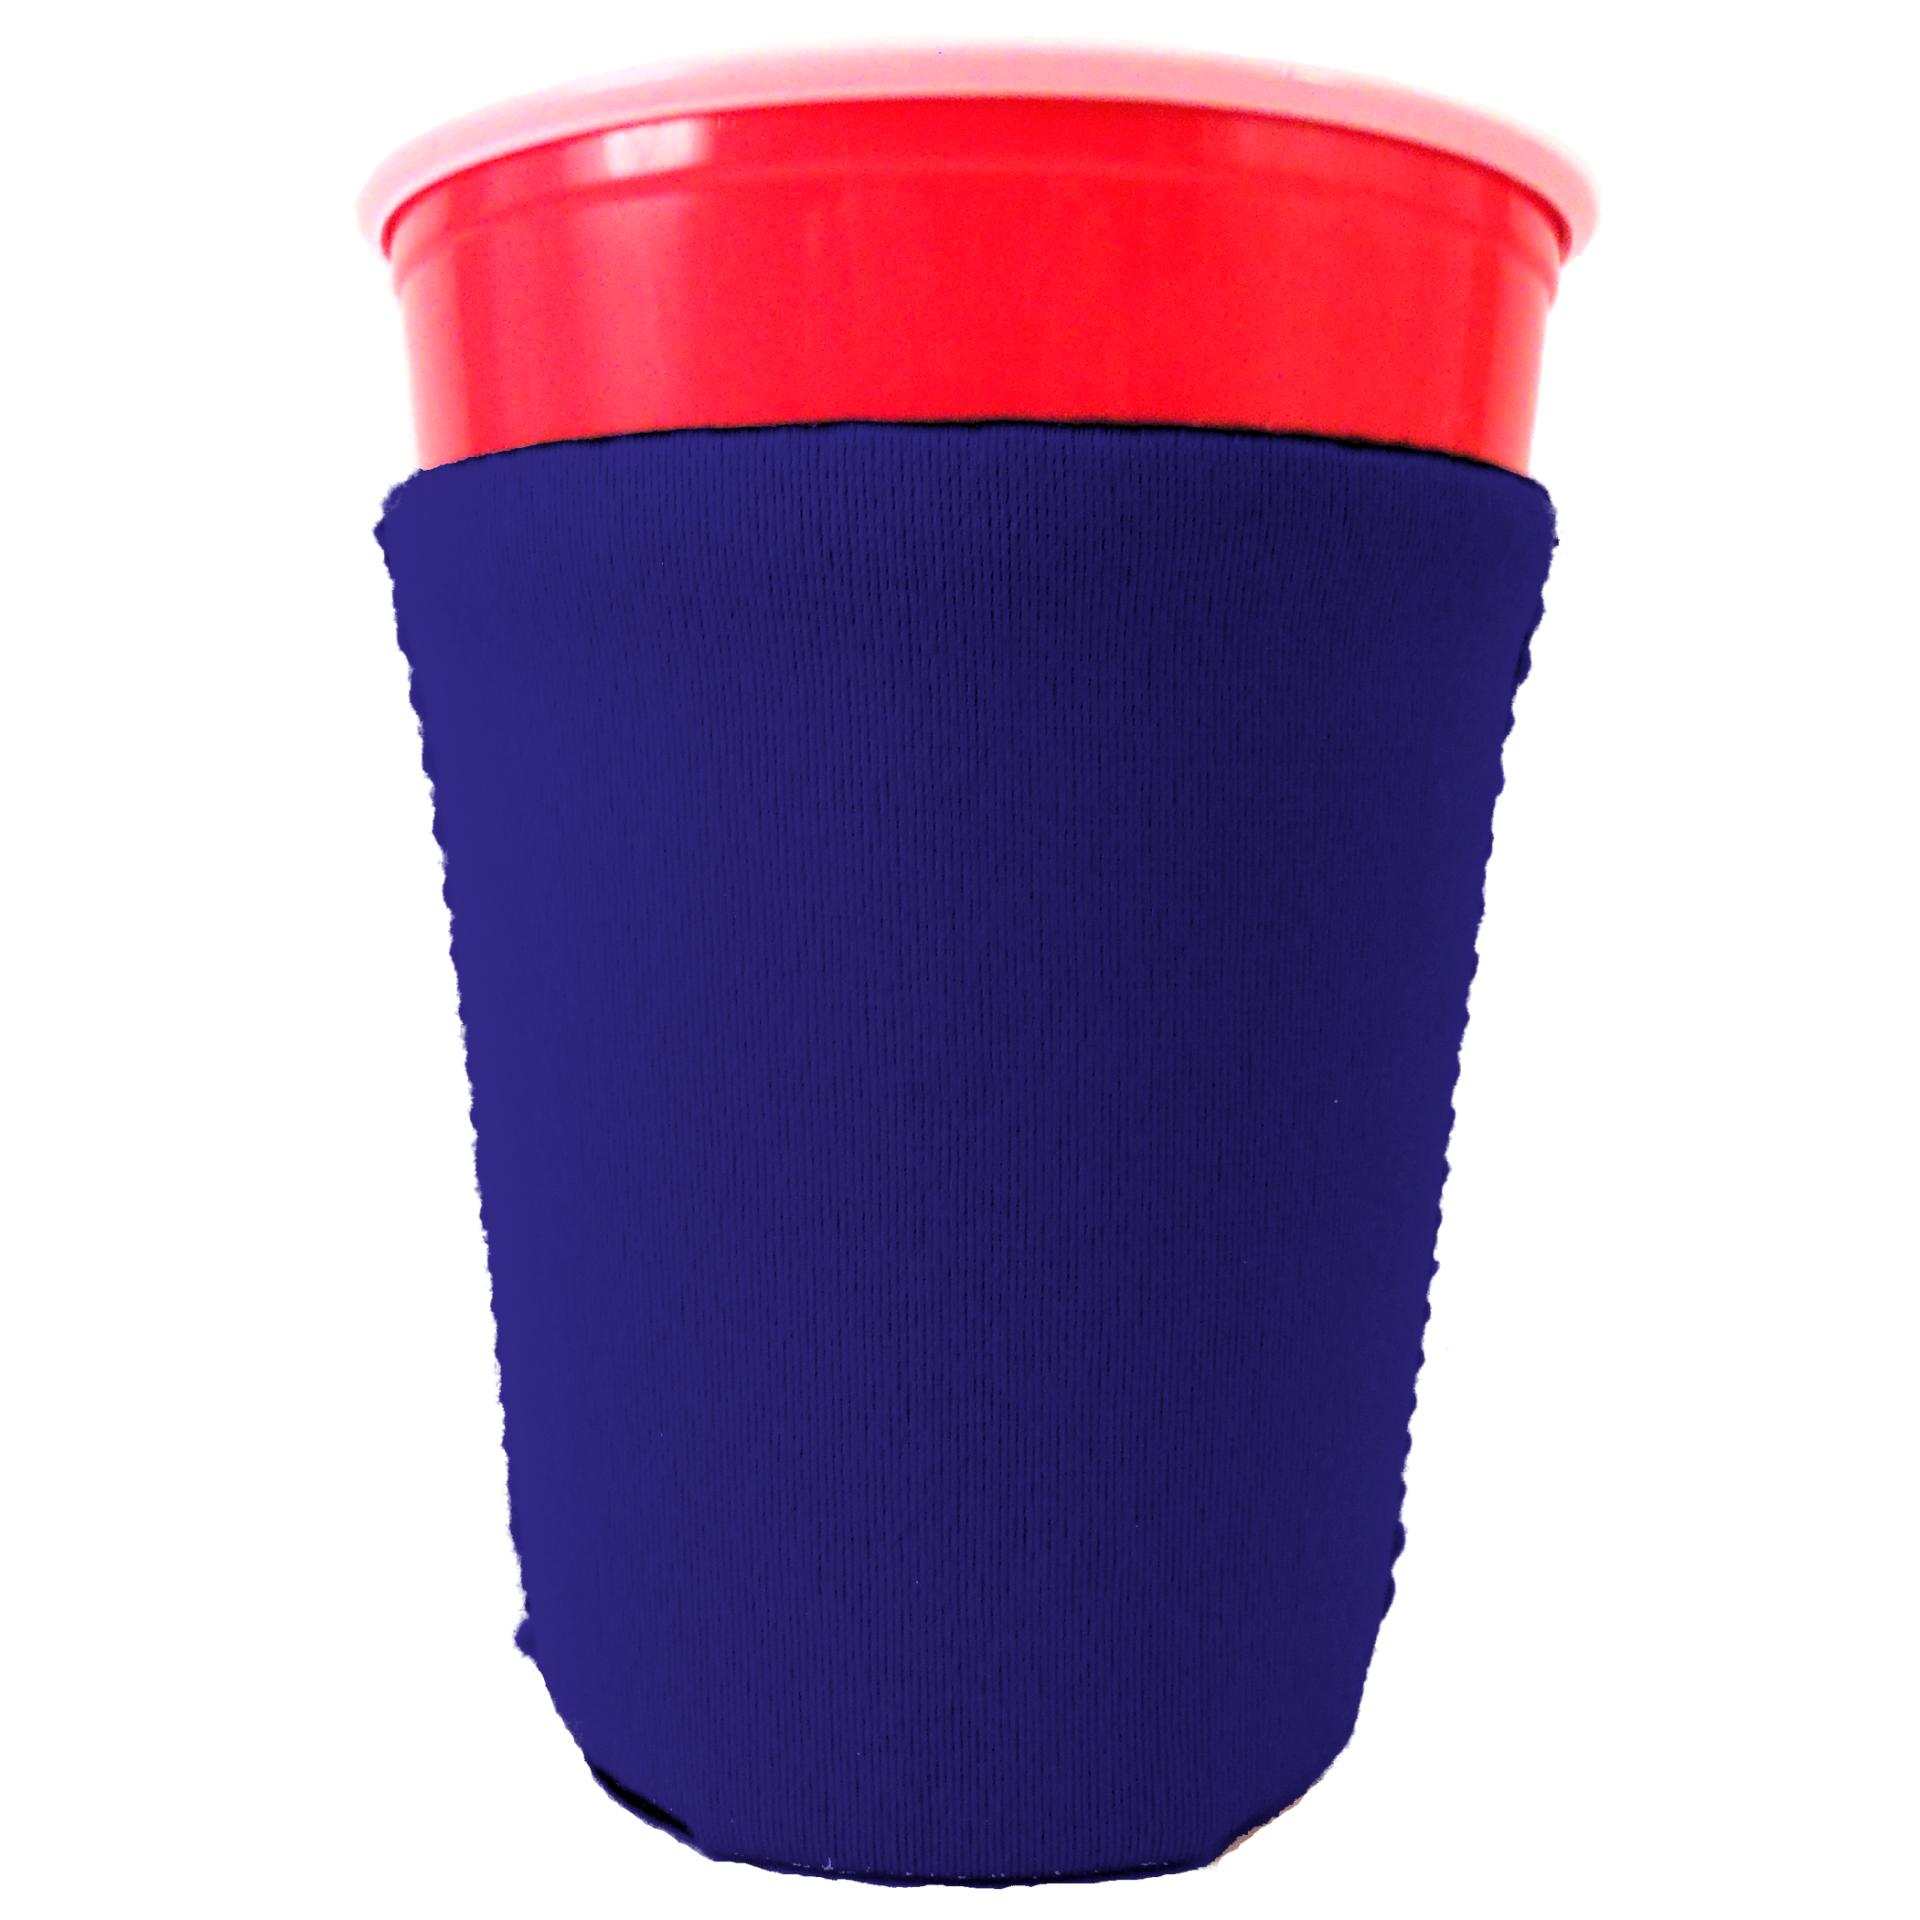 Blank Neoprene Solo Cup Koozie